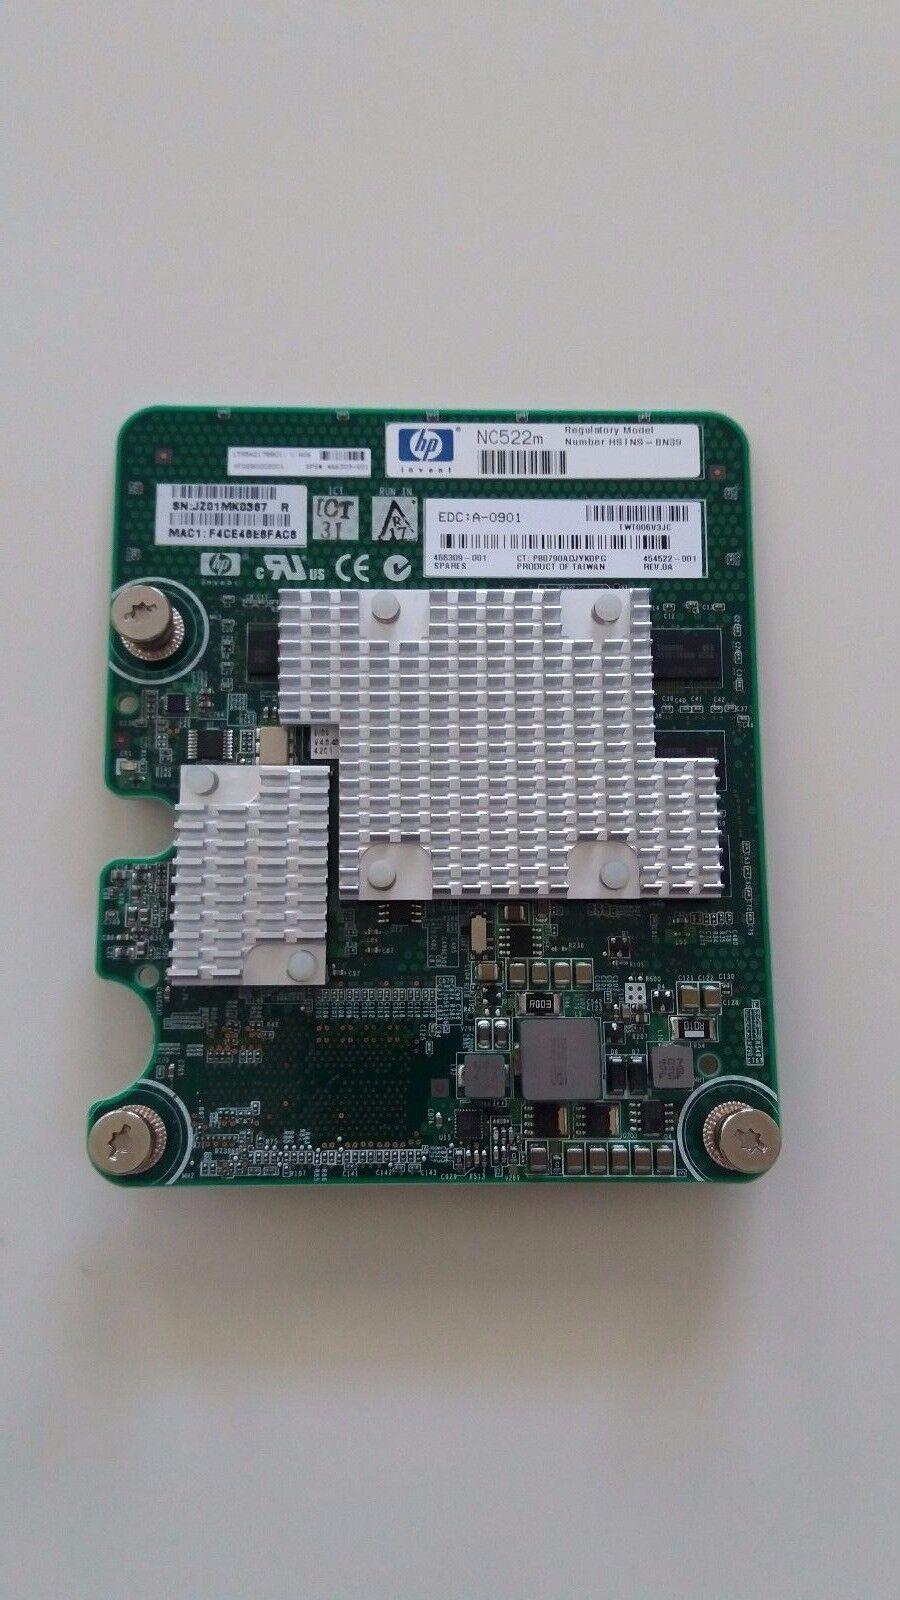 HP 466309-001 NC522M Dual Port Flex-10 10GB BL-C Network Card